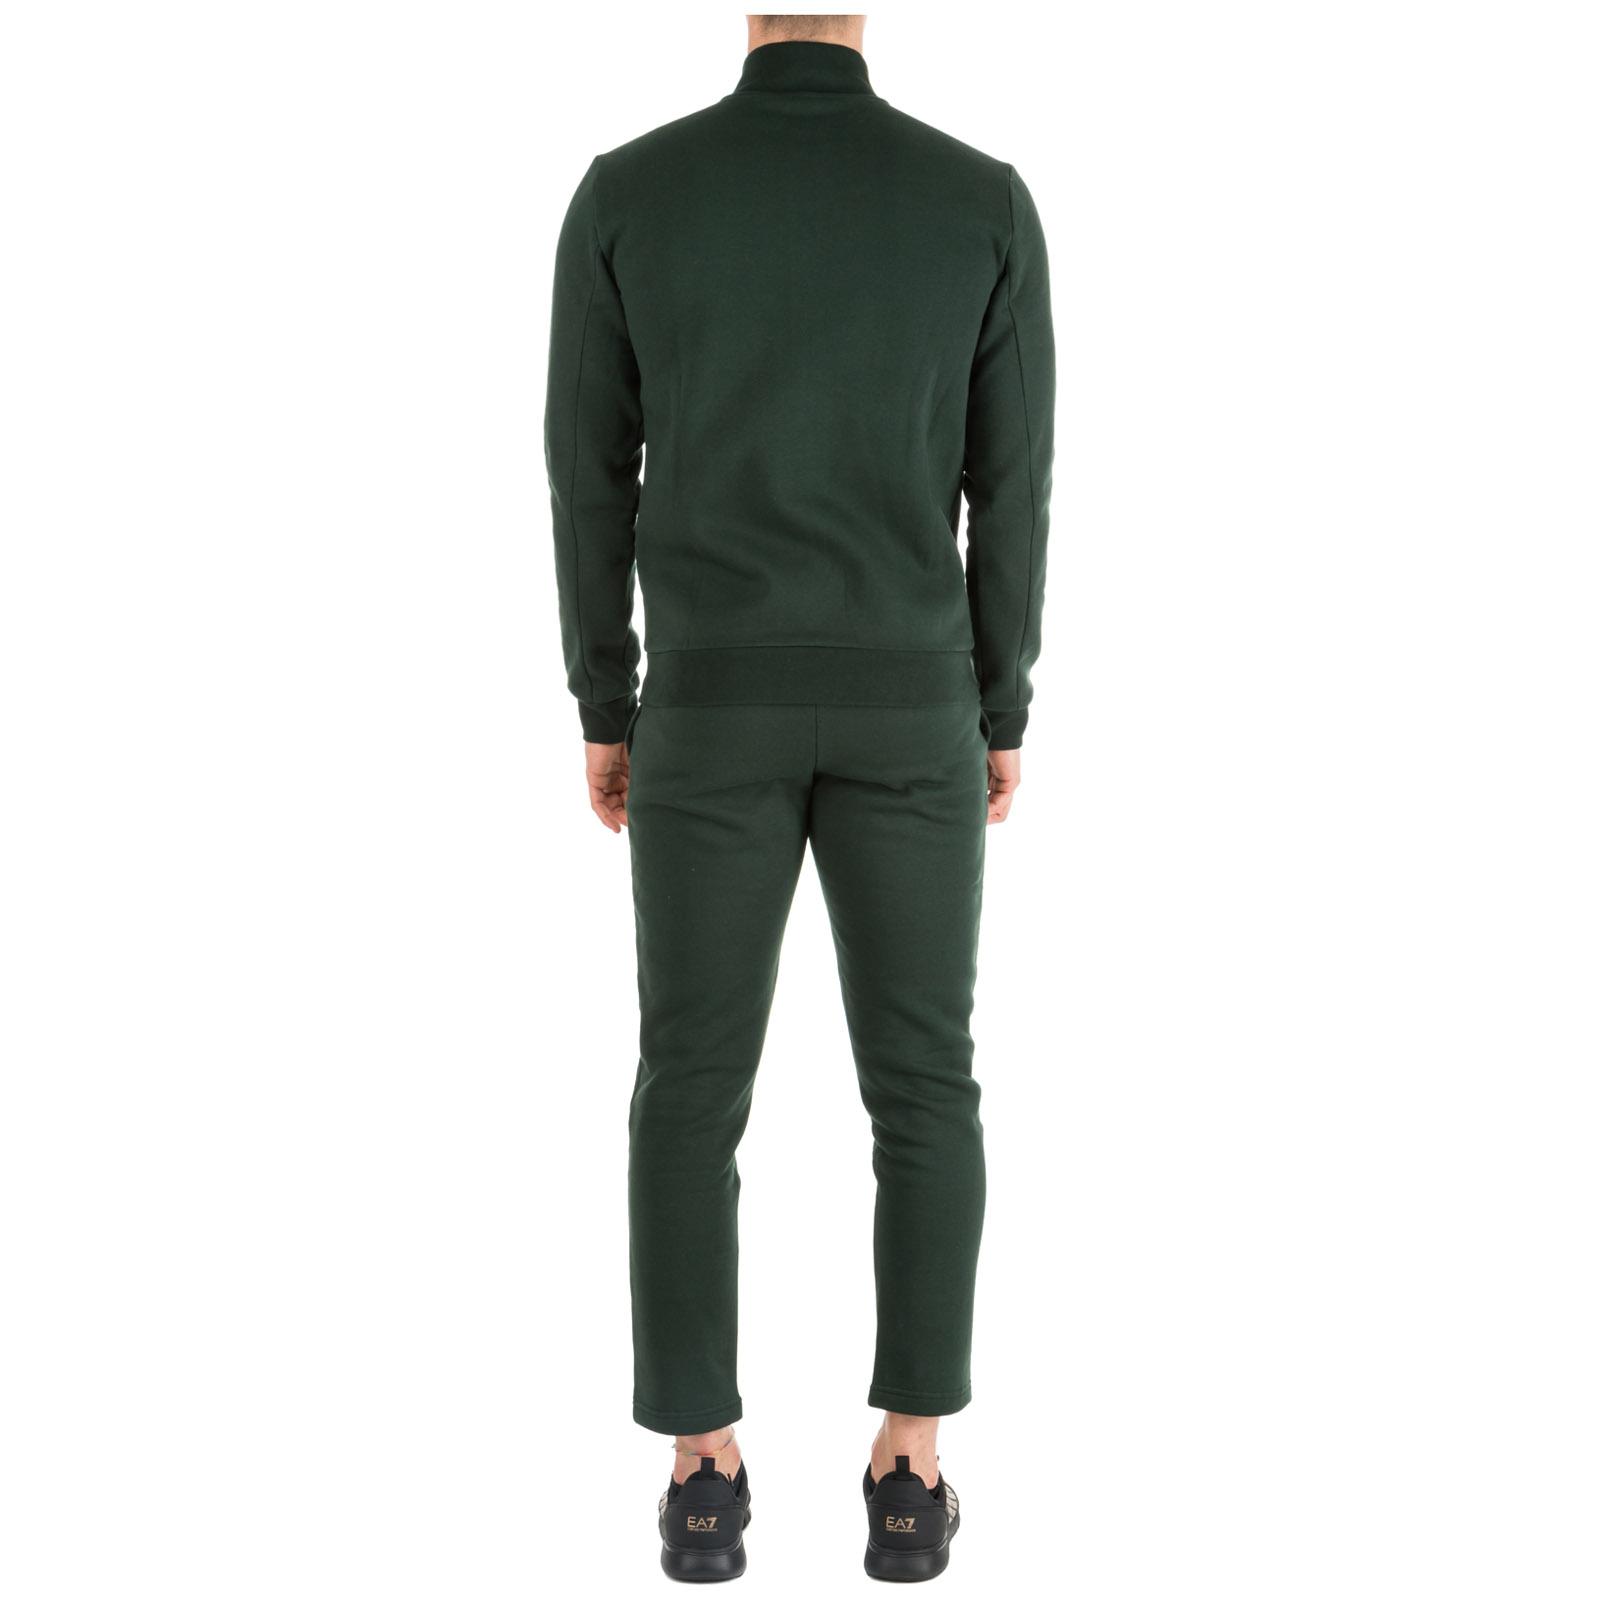 info for b2f1c c6938 Tuta uomo fashion completo felpa pantaloni